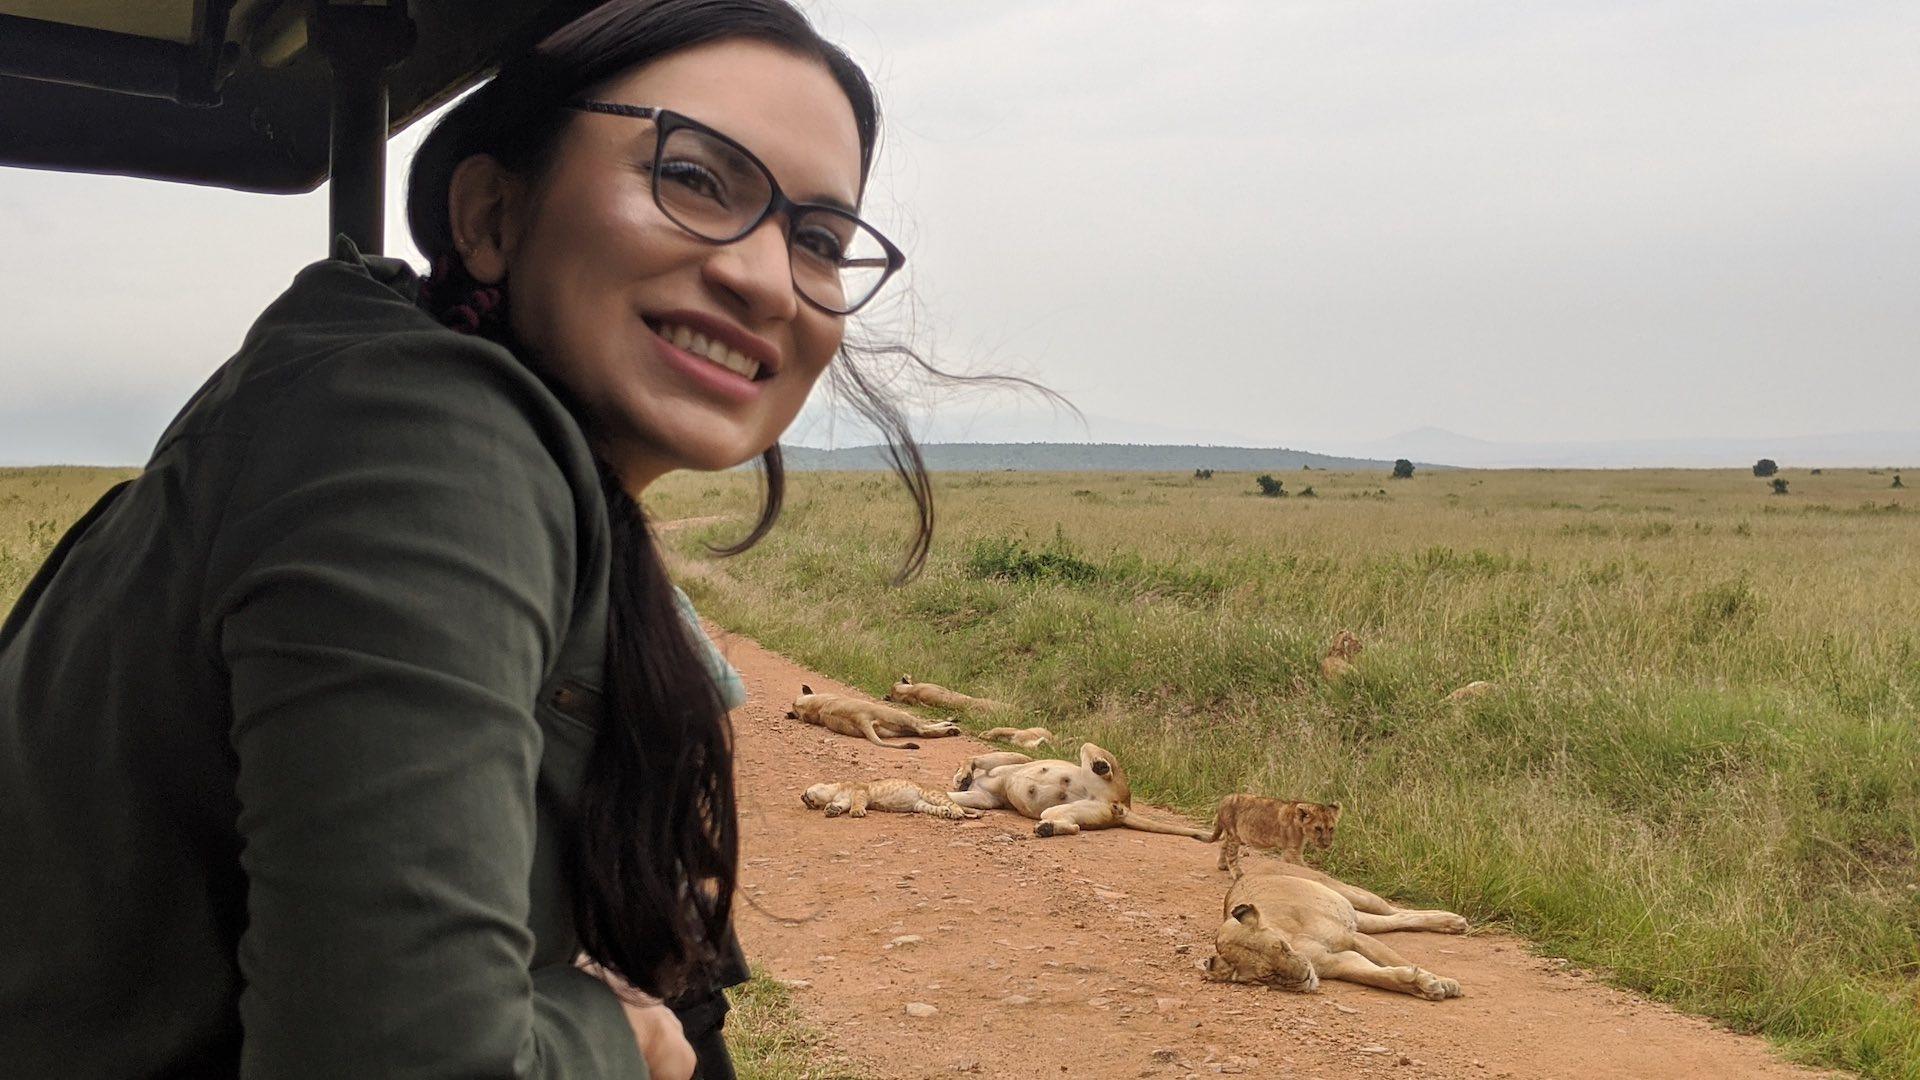 Neha in Maasai Mara Game Reserve Kenya Africa_Lion pride and cub_AOT